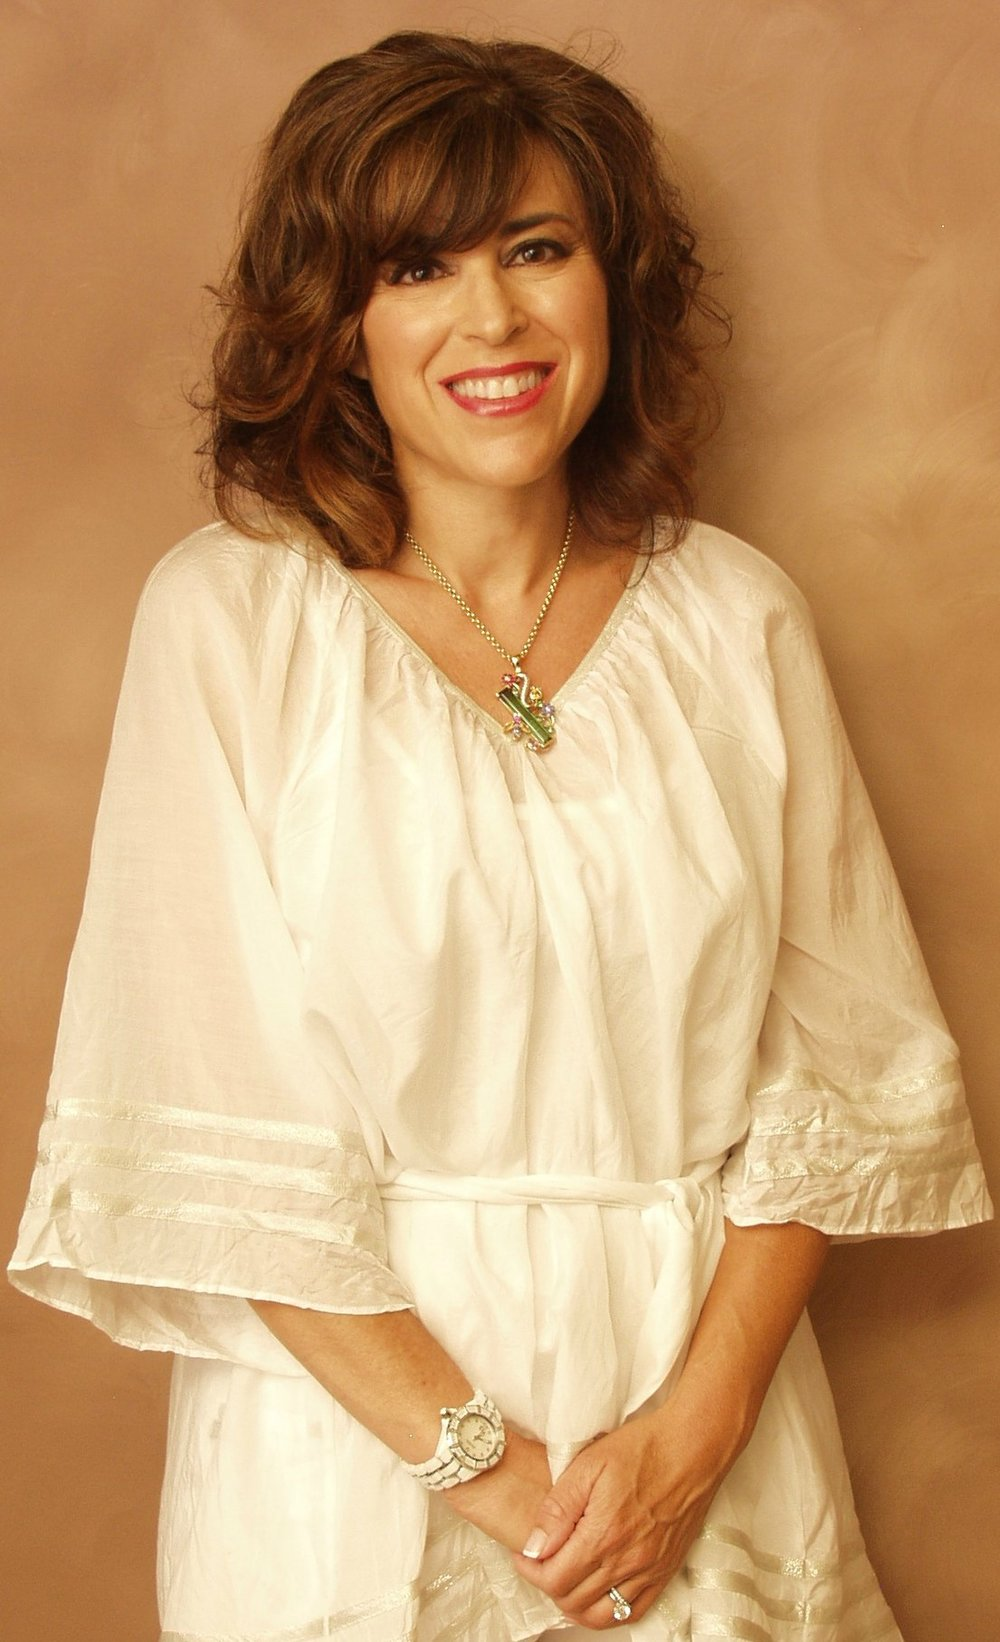 PreQM Founder Wendy Baruh.jpg